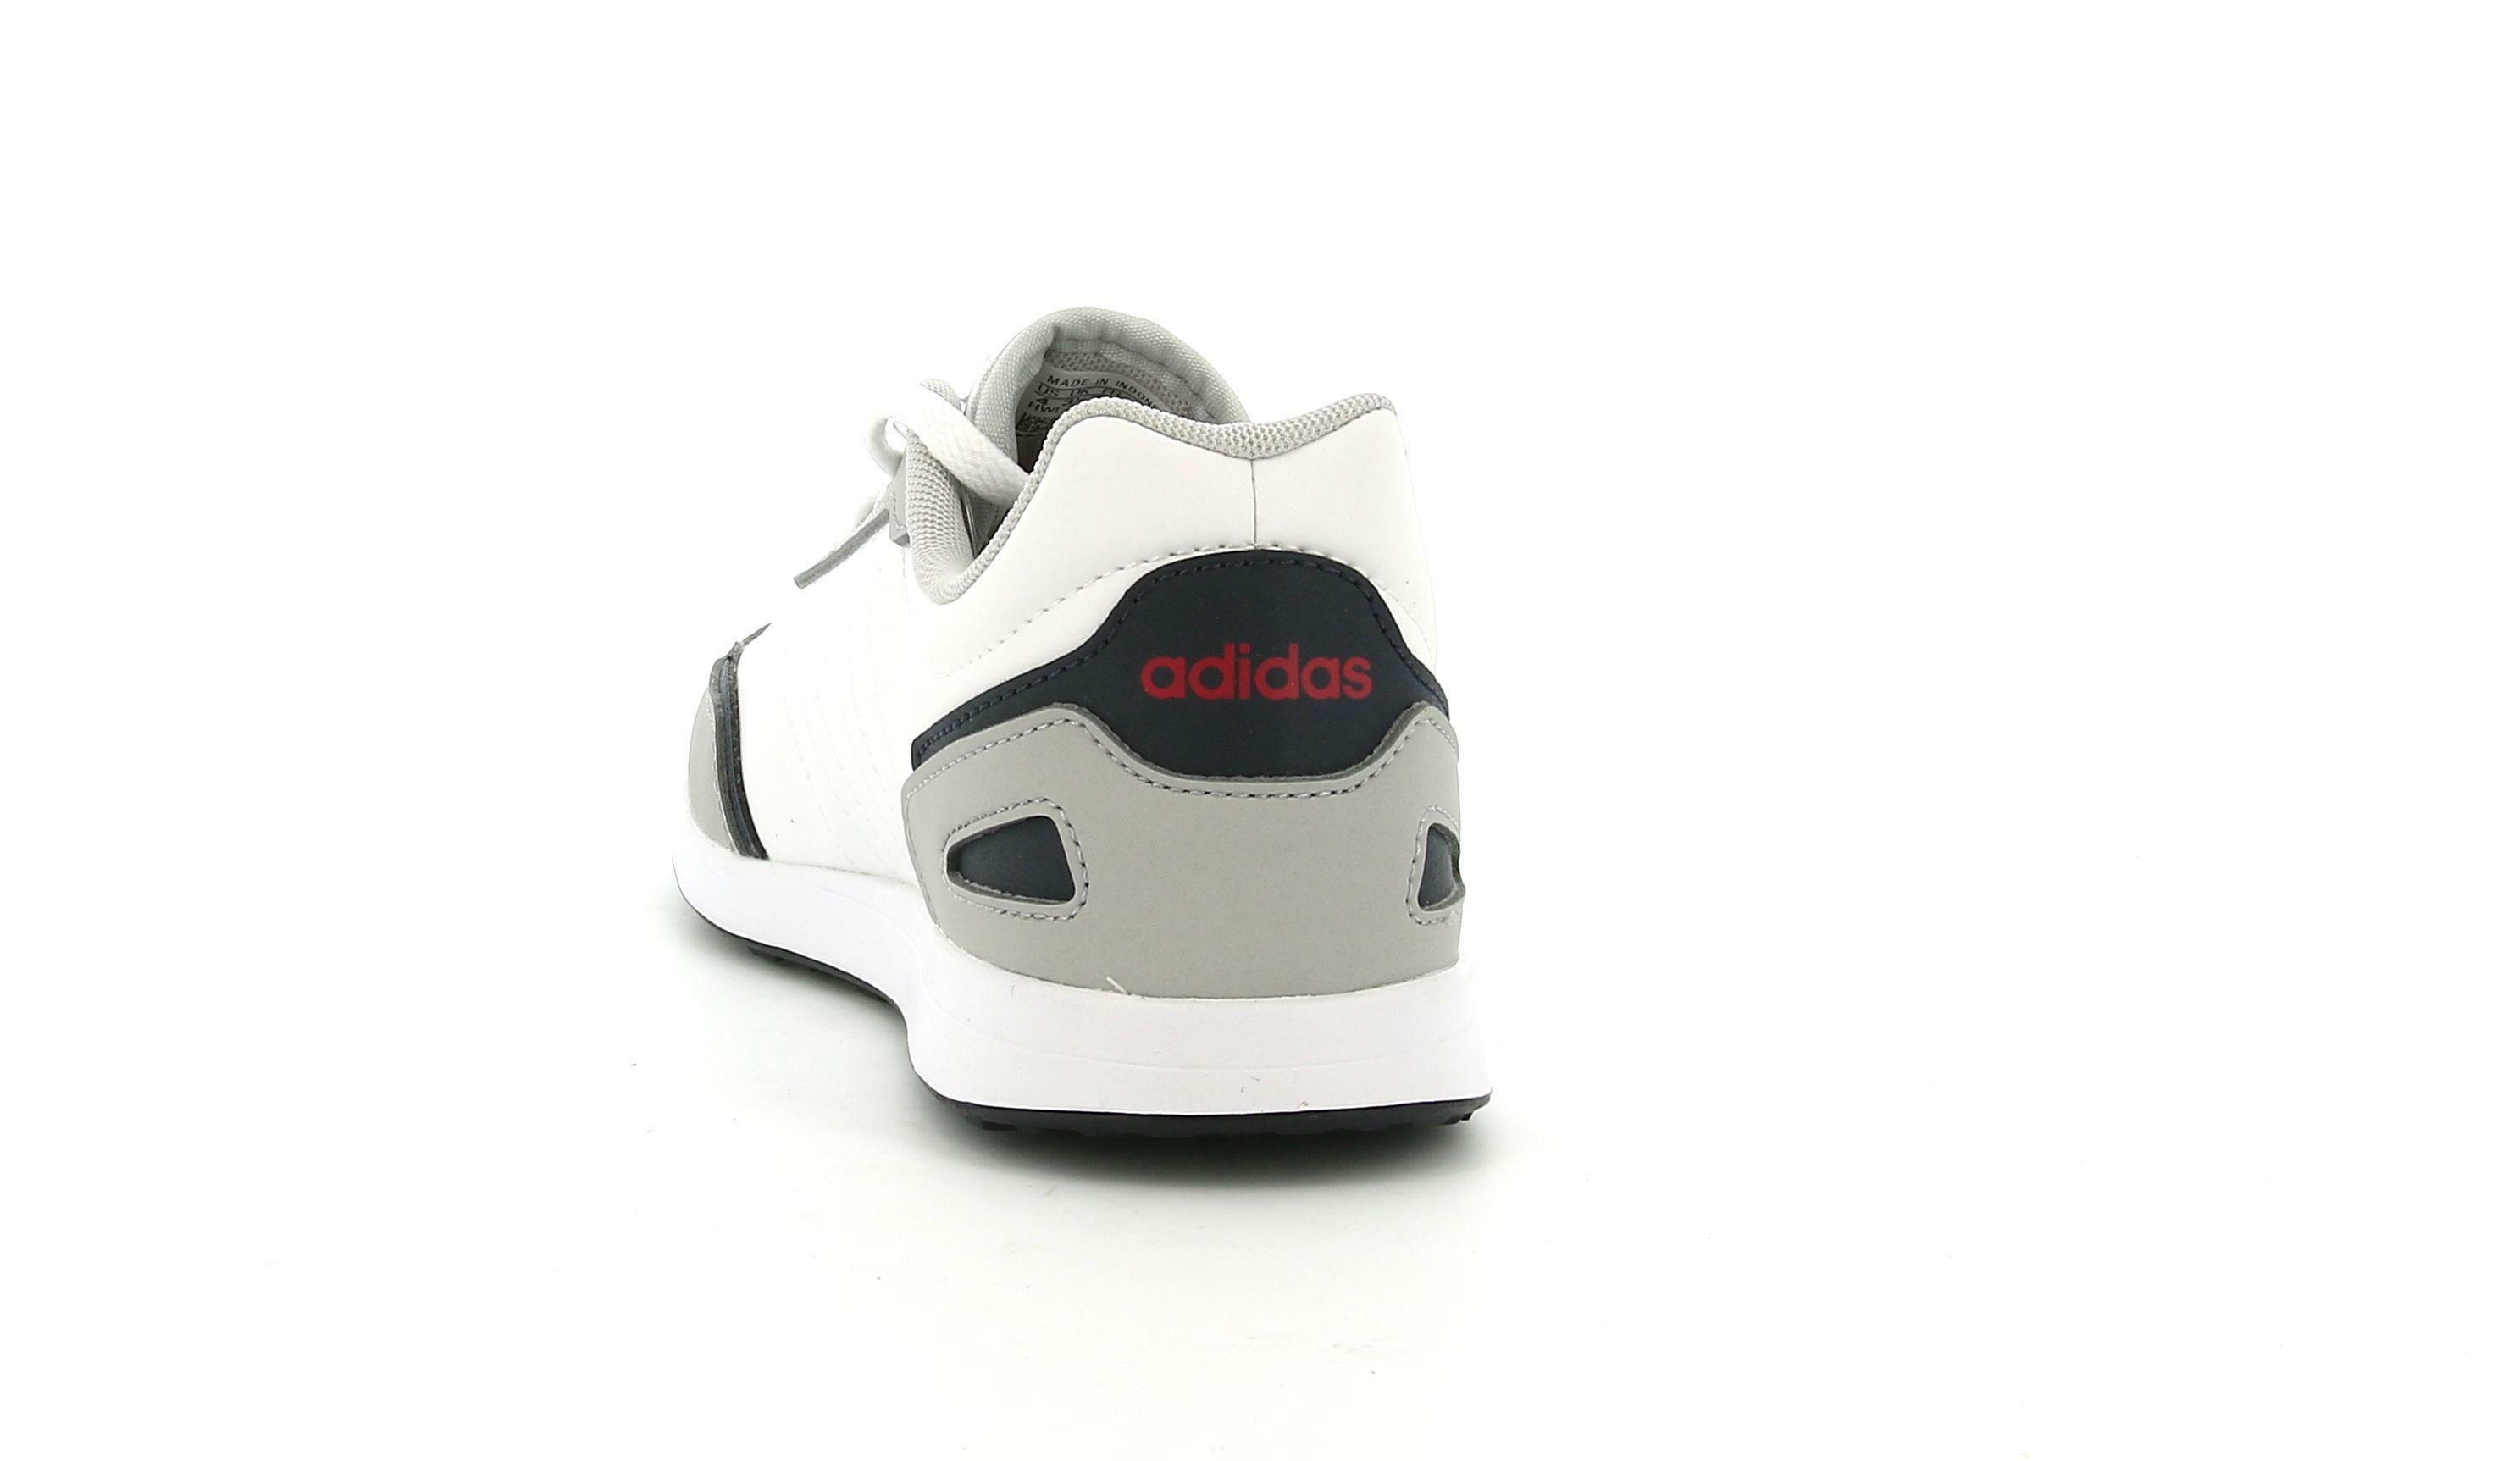 adidas adidas vs switch 3 k scarpe da ginnastica unisex-bambini fw9307 scarpe donna